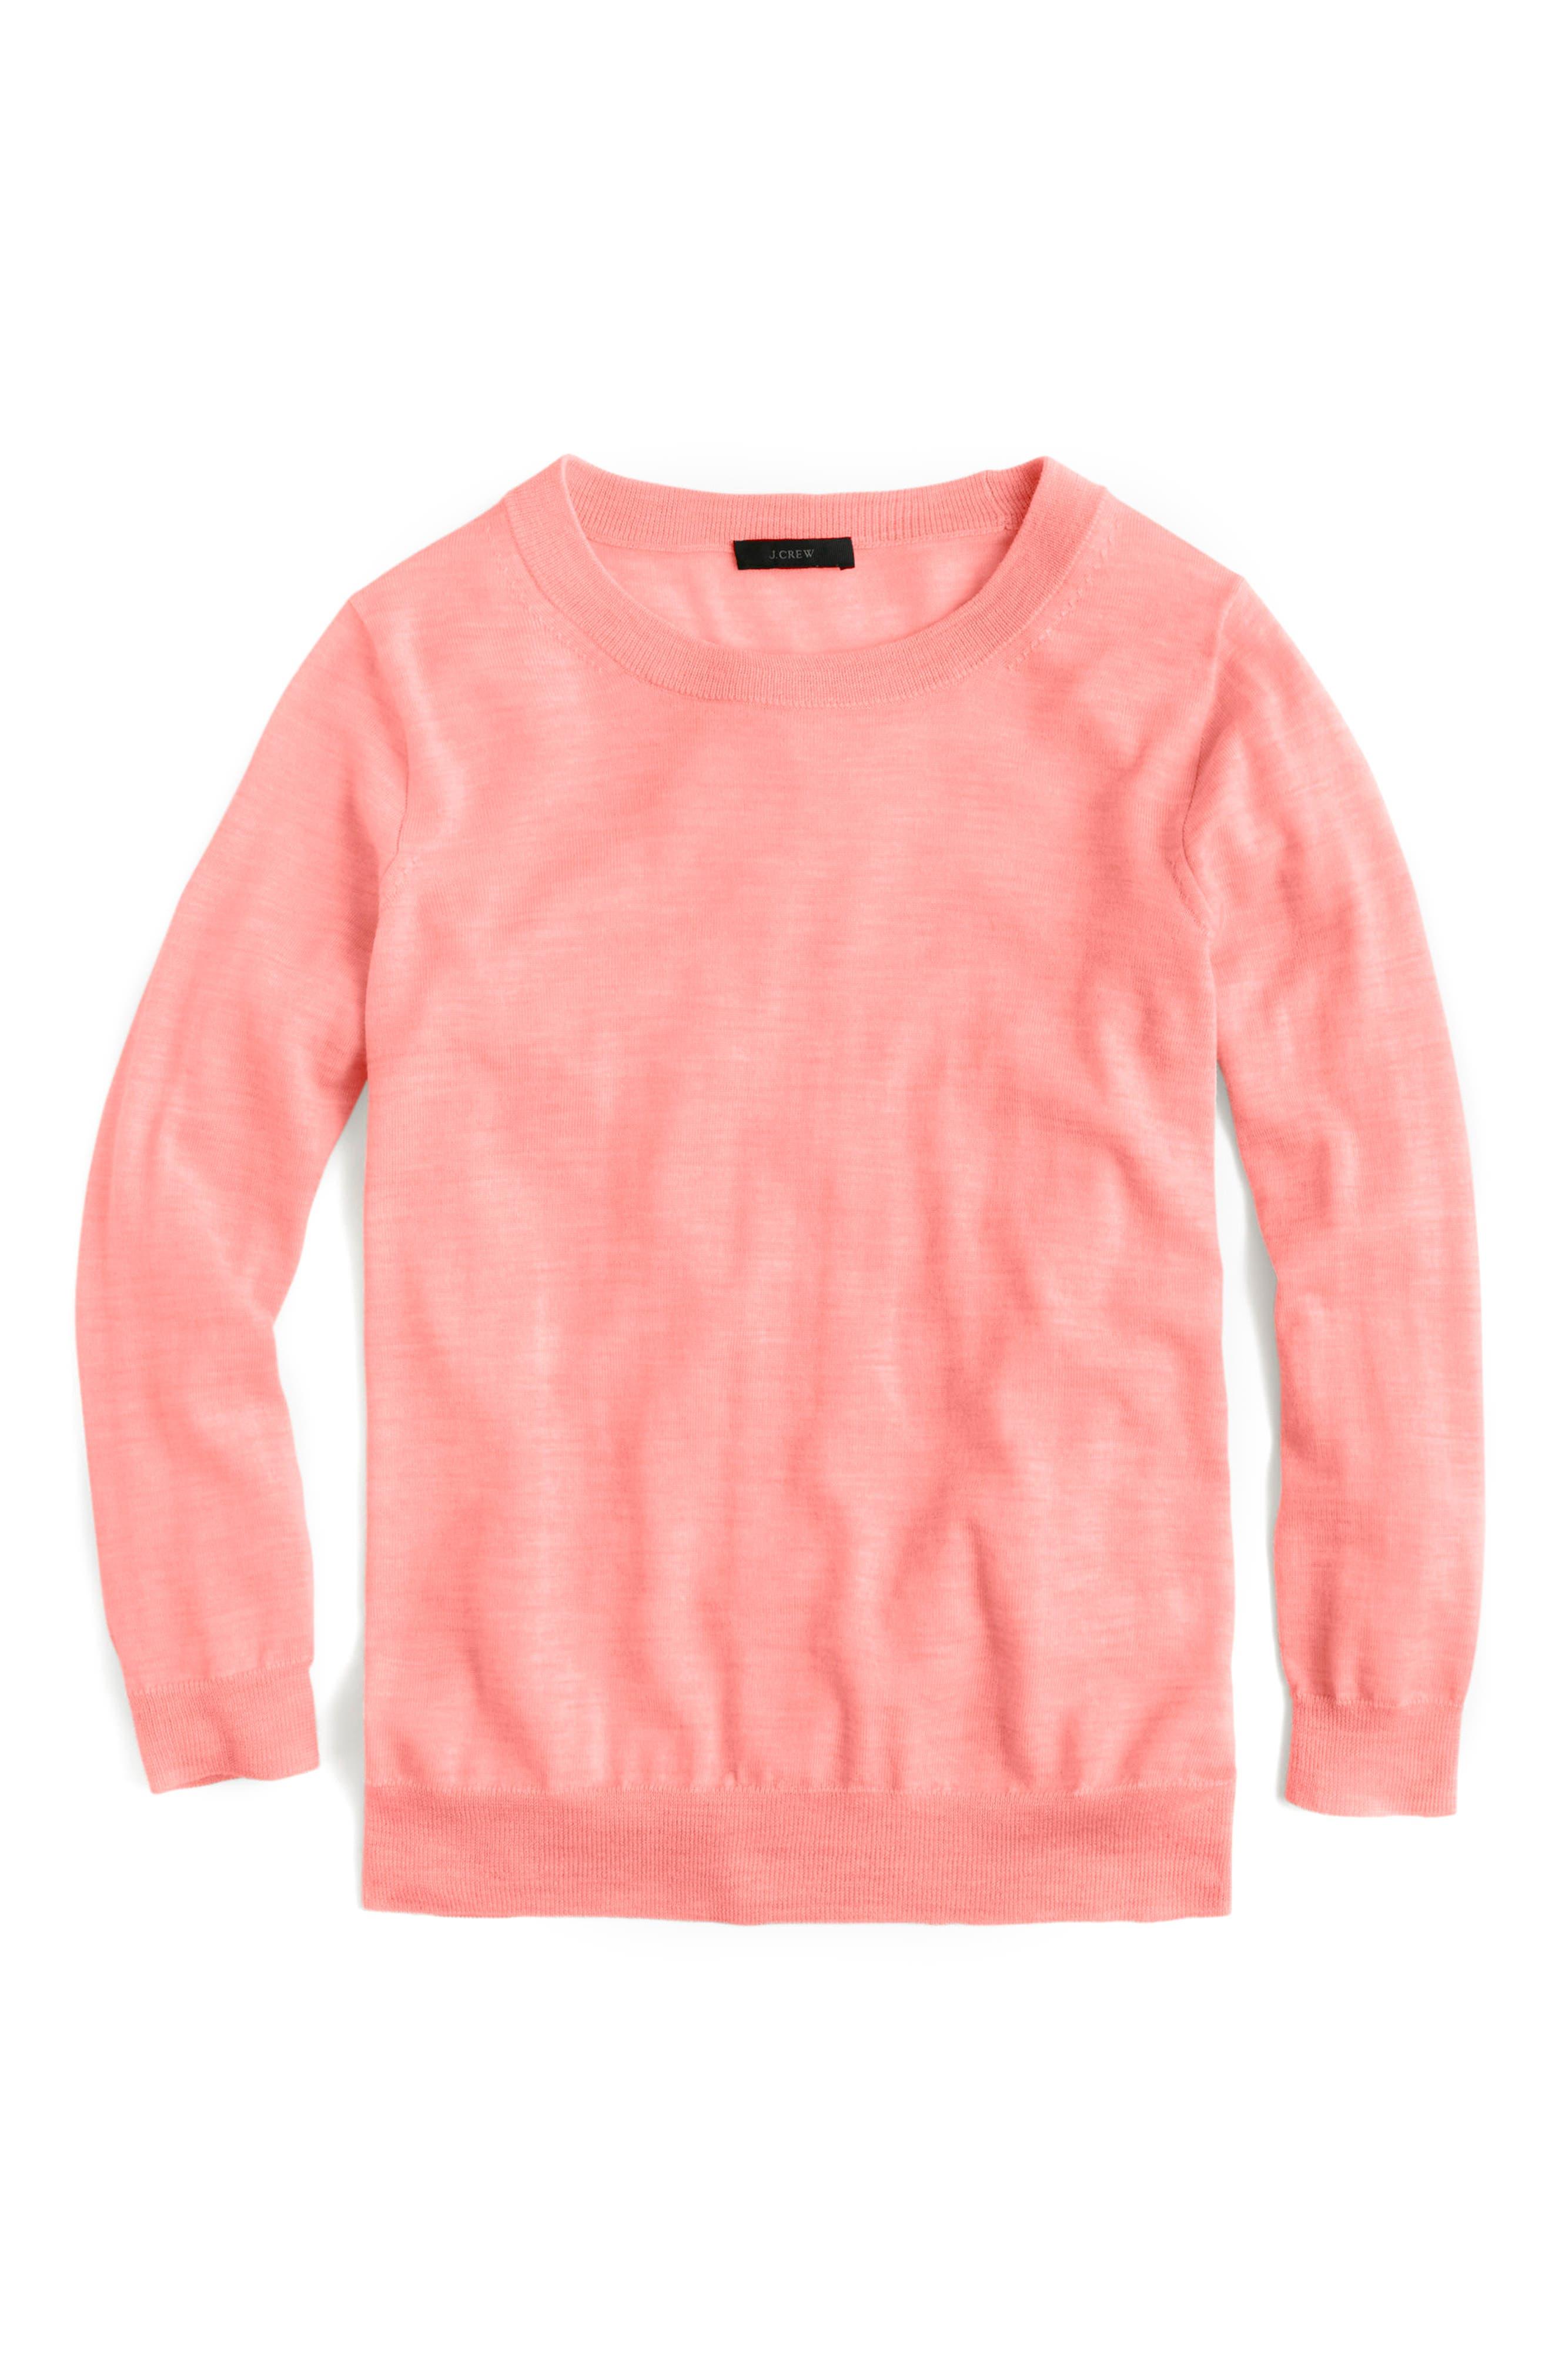 J.Crew Tippi Merino Wool Sweater